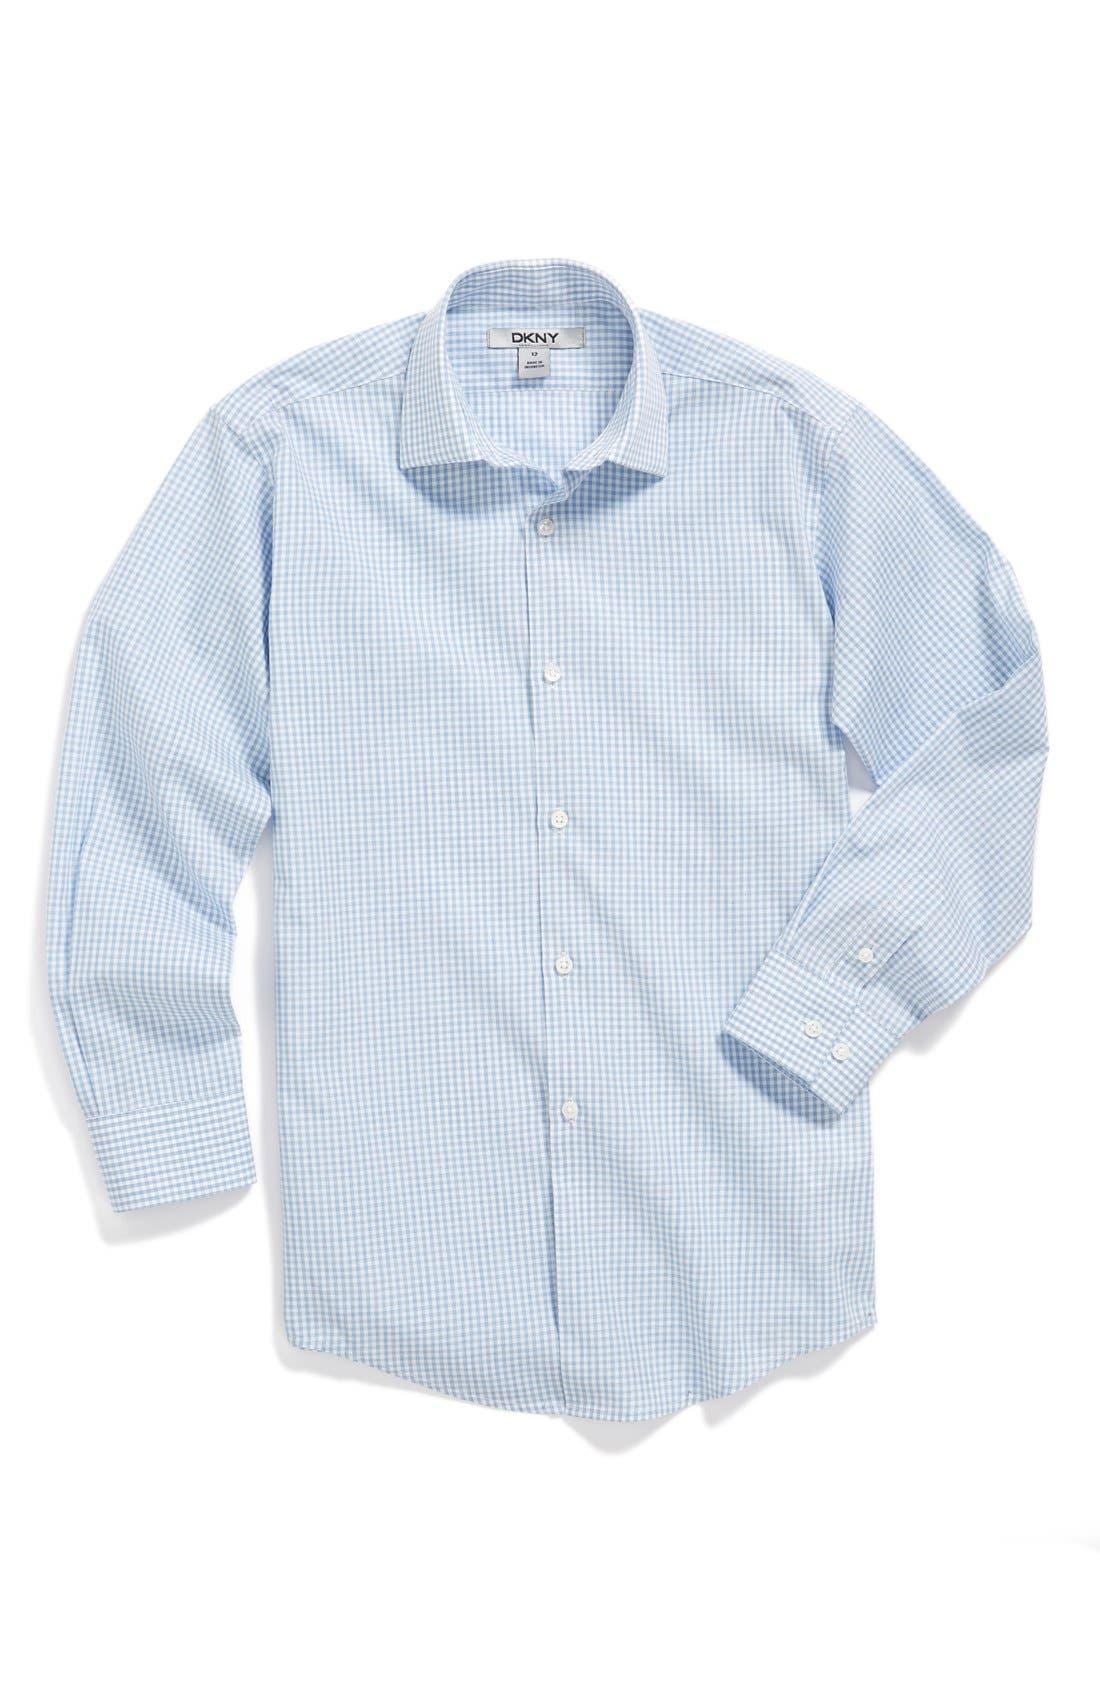 Main Image - DKNY Check Dress Shirt (Big Boys)